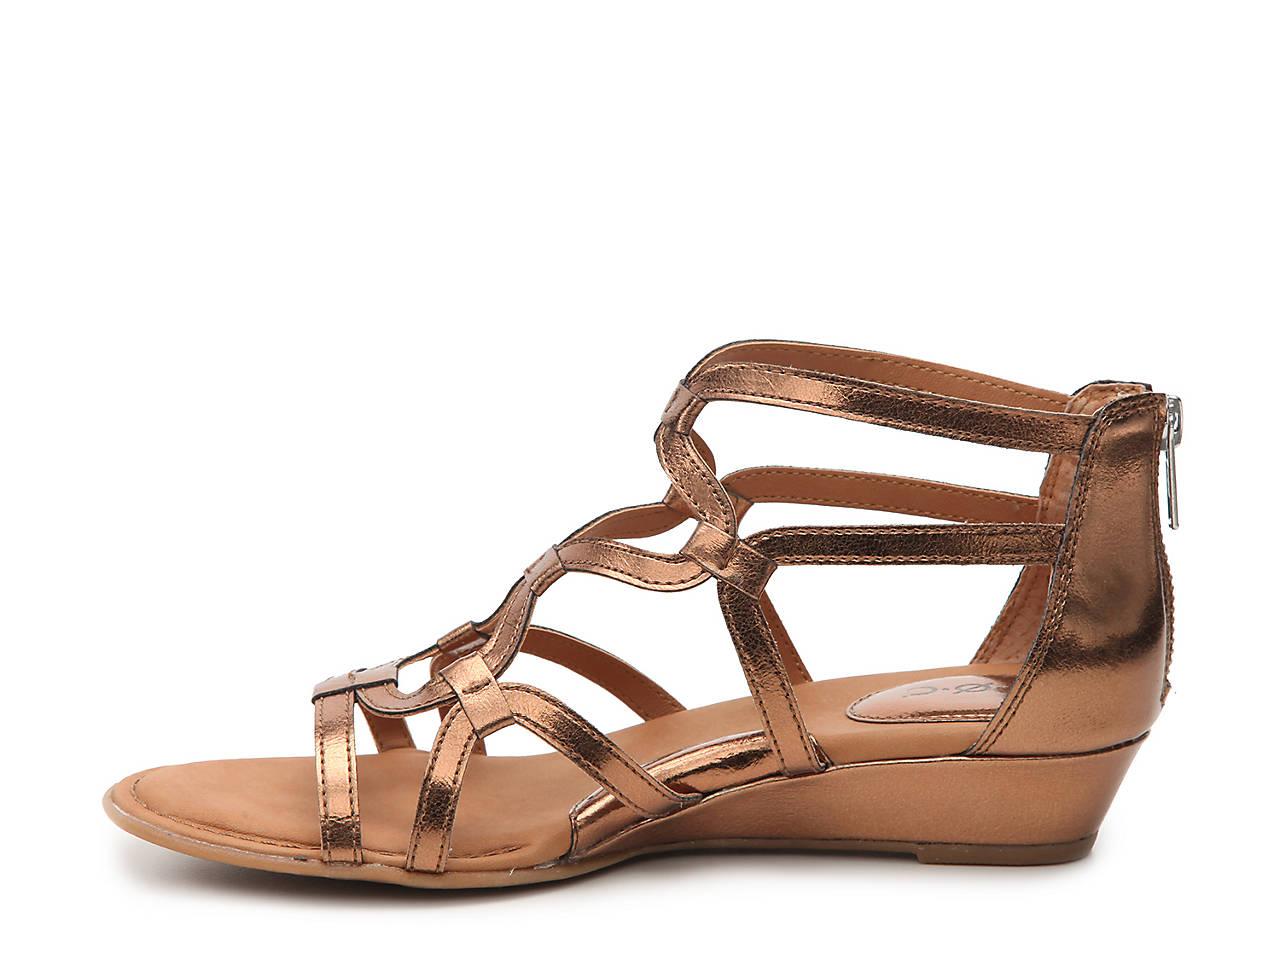 00e8b562296b b.o.c Pawel Wedge Gladiator Sandal Women s Shoes